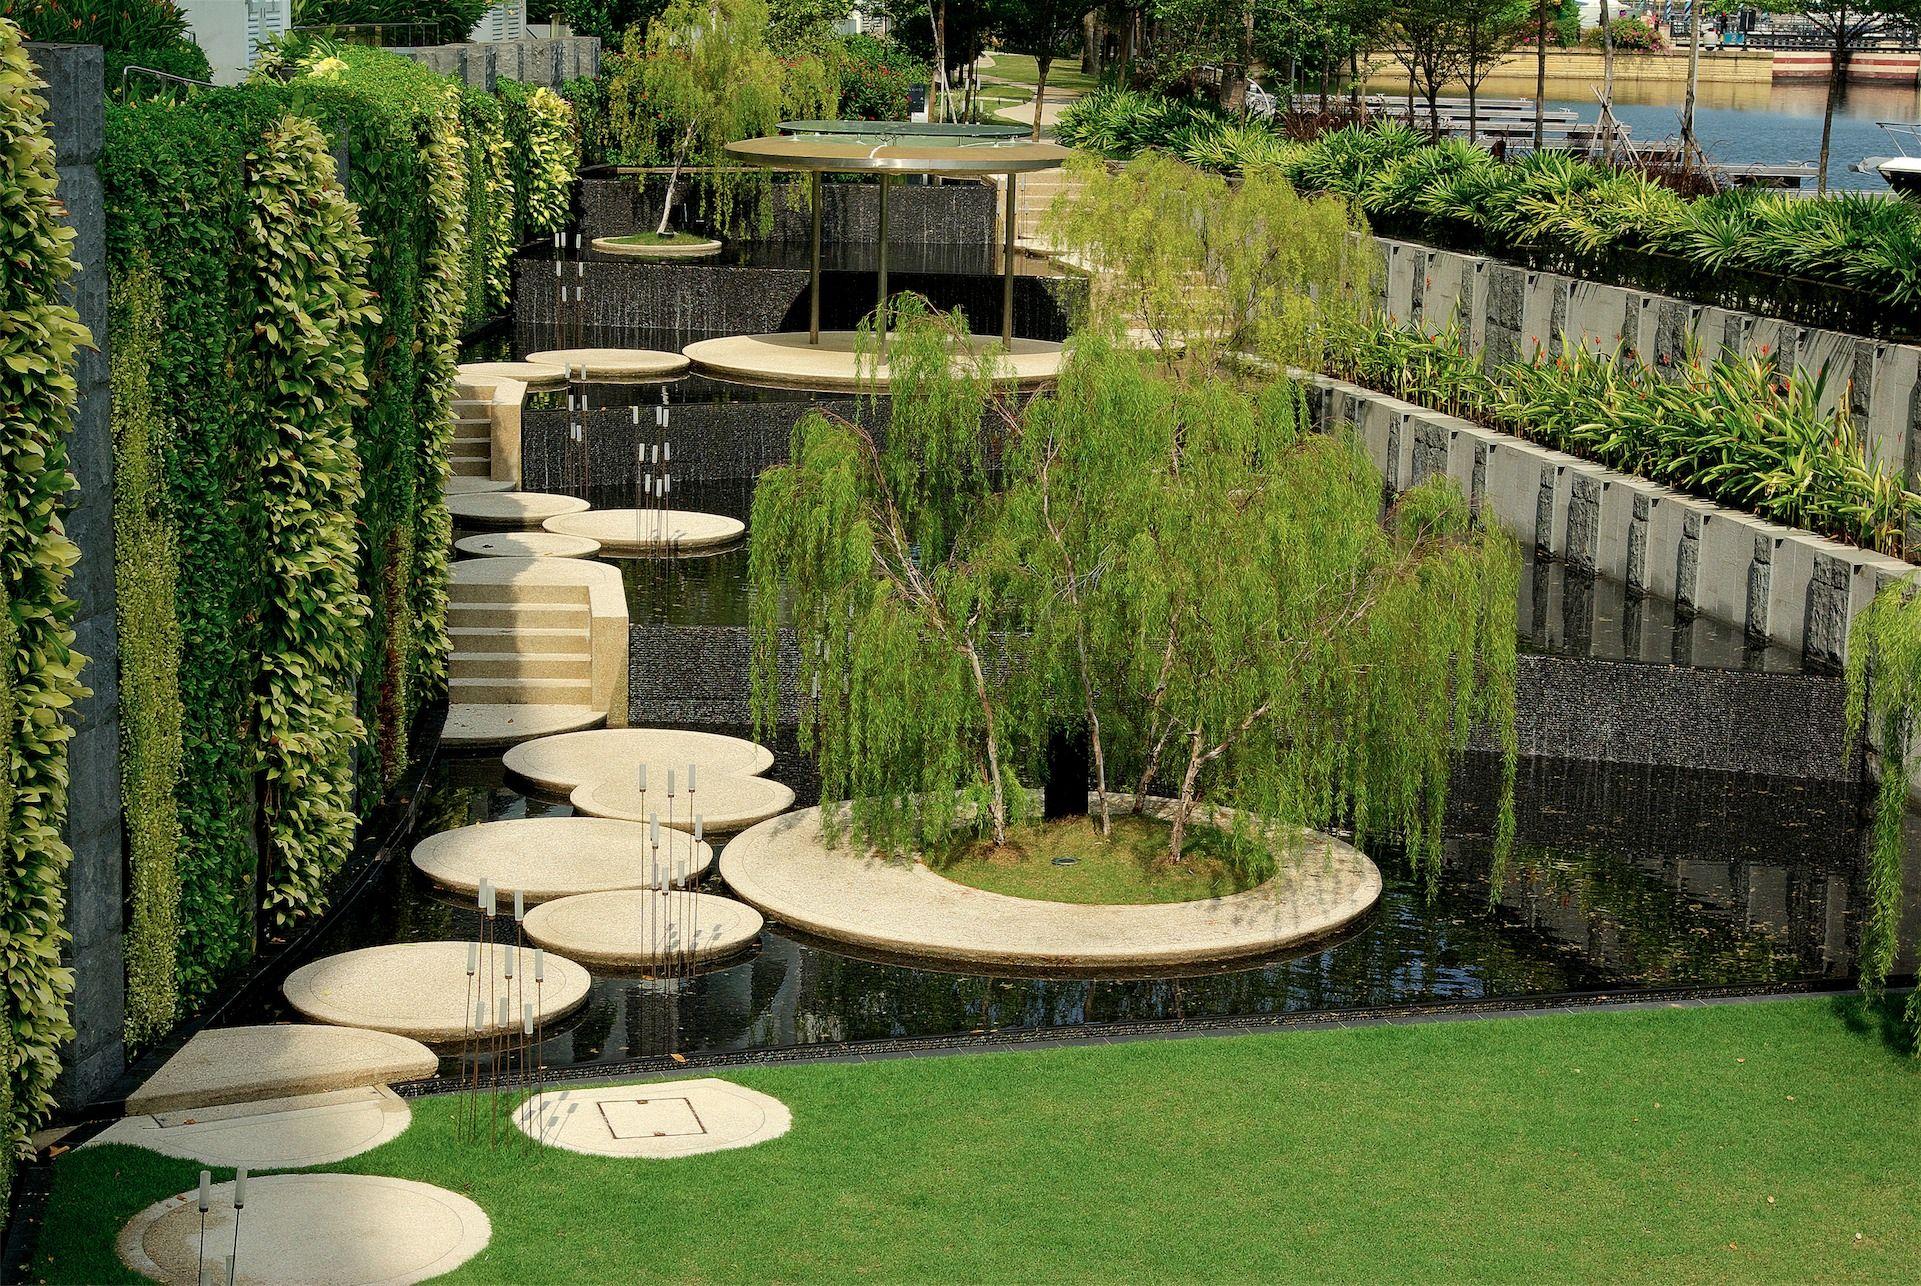 The coast sentosa singapore by tierra design pod for Gartengestaltung urban